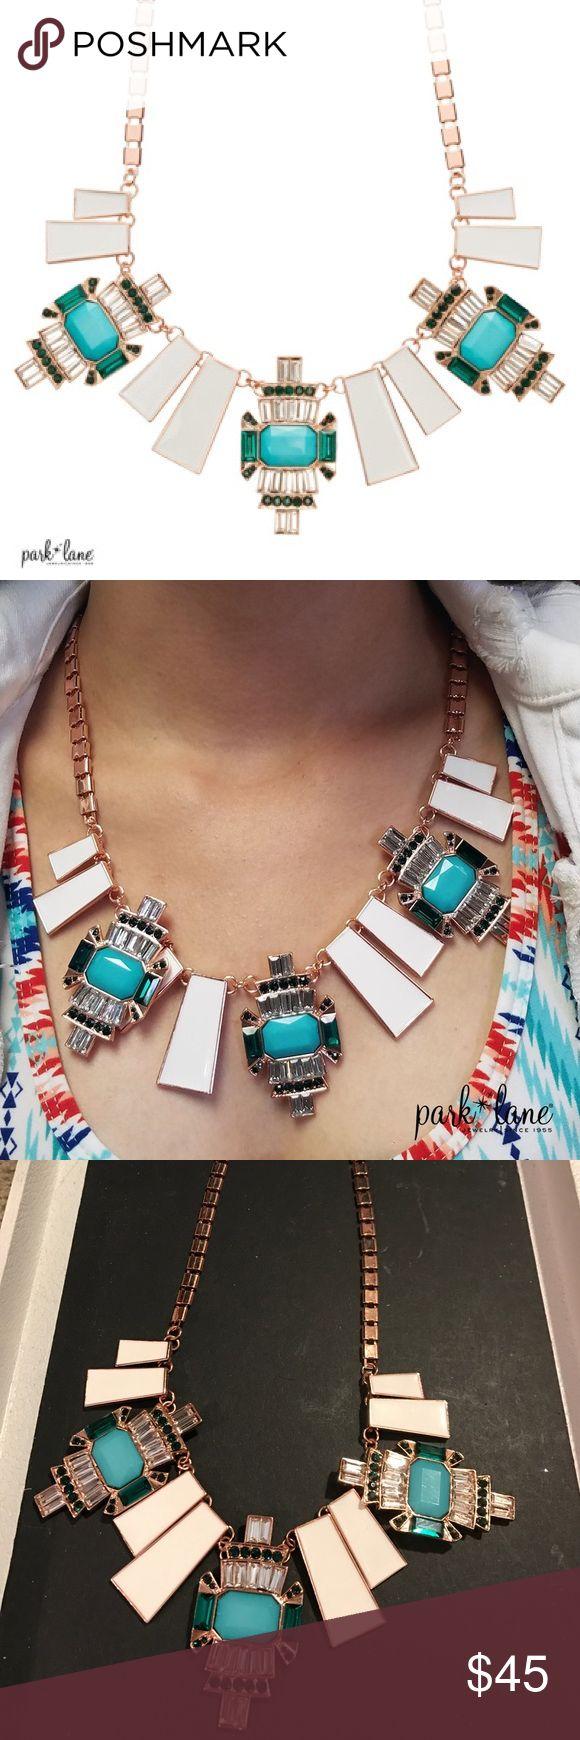 Park lane Aloha neck. NWT. Park lane aloha neck. NWT. Fun statement piece! Park Lane Jewelry Necklaces